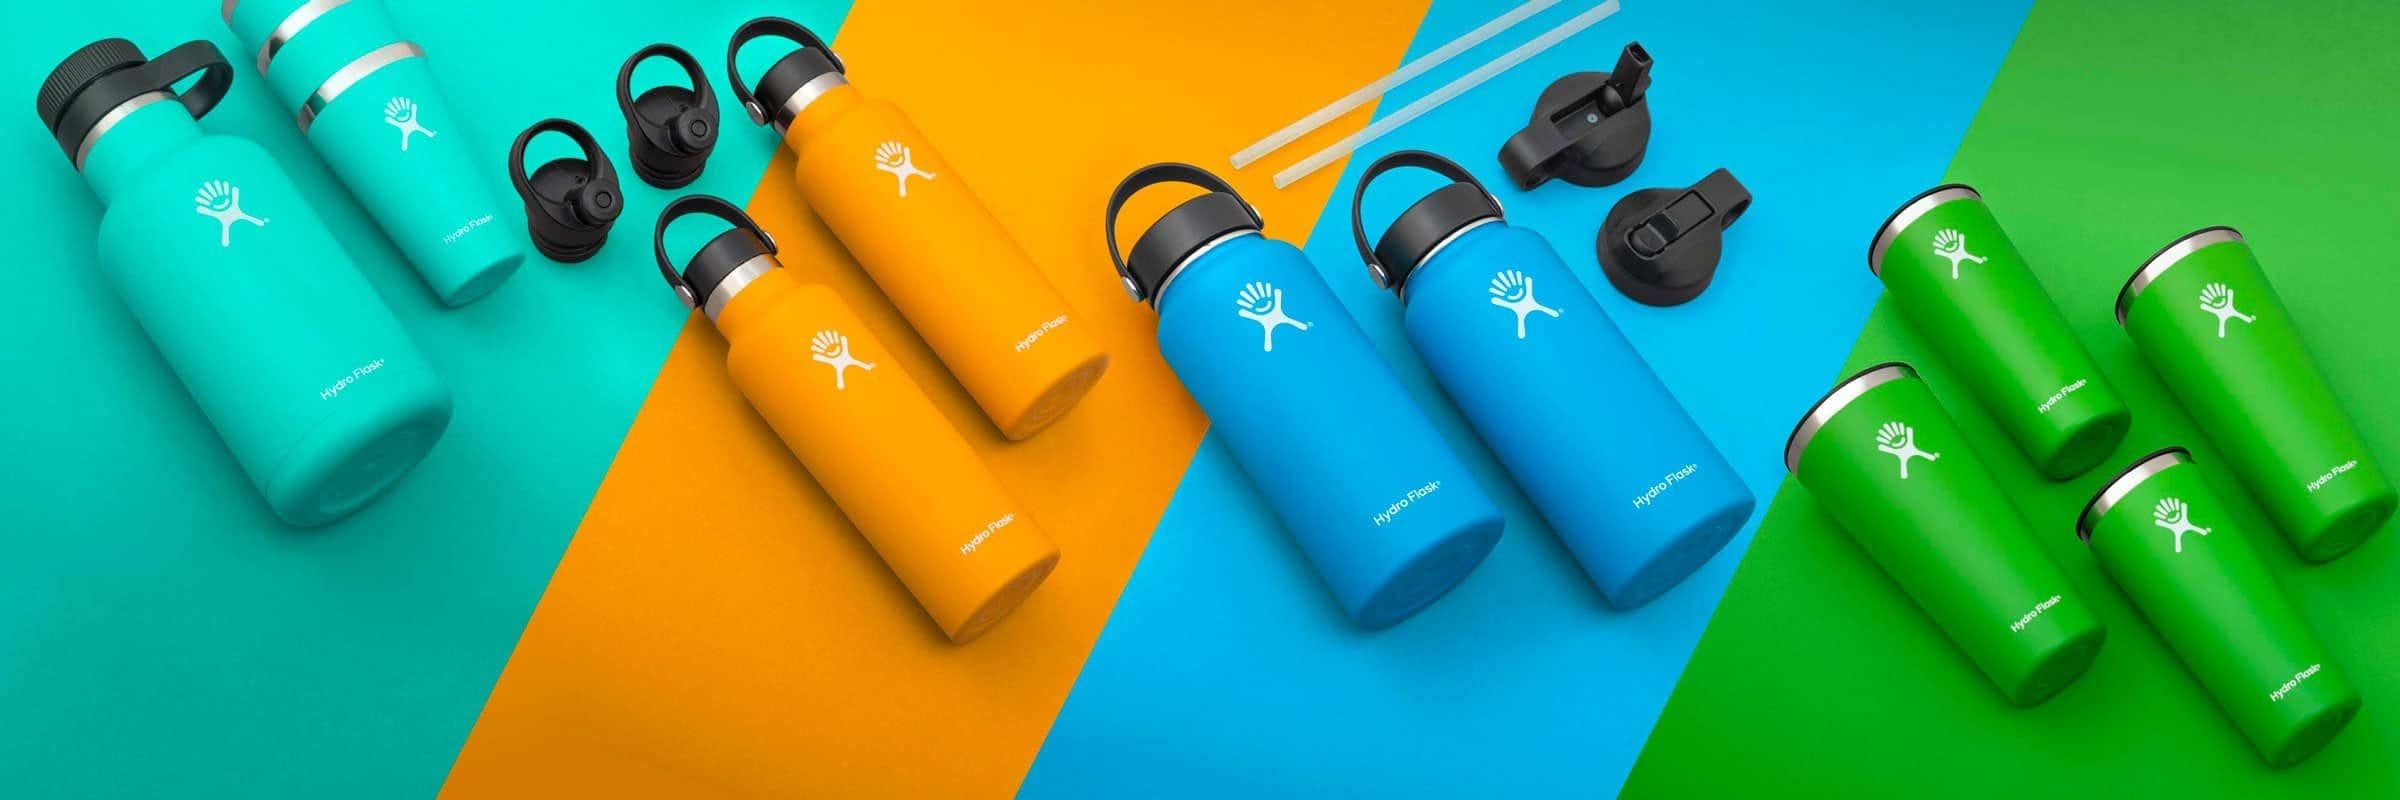 Fitletic, hydro flask, Klean Kanteen, Mizu, Nalgene, Nathan, Salomon, Tacx, Zefal. How to Choose the Right Water Bottle